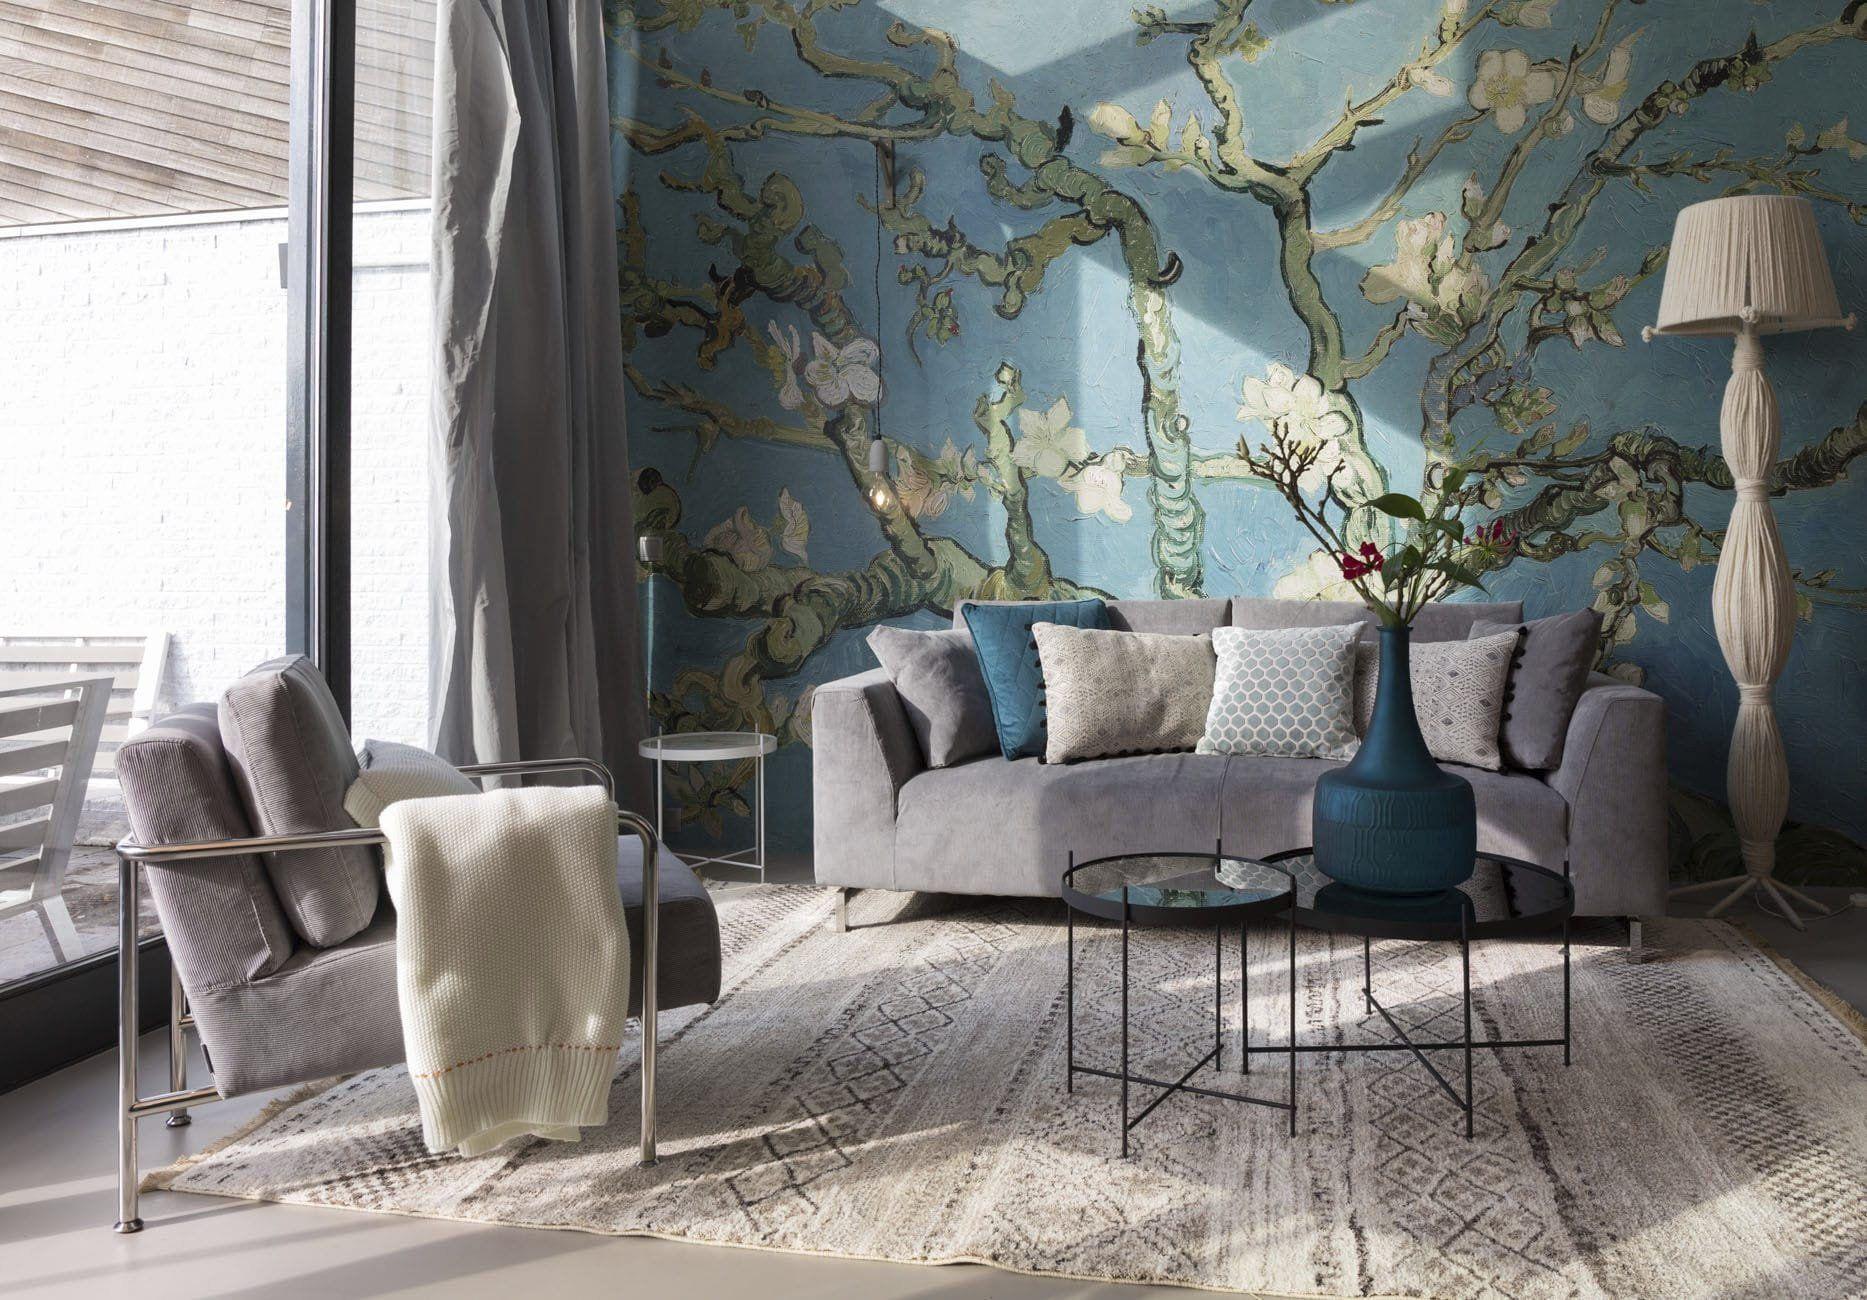 Blossom Almond Tree Wall Mural, Art Wallpaper, Wall décor